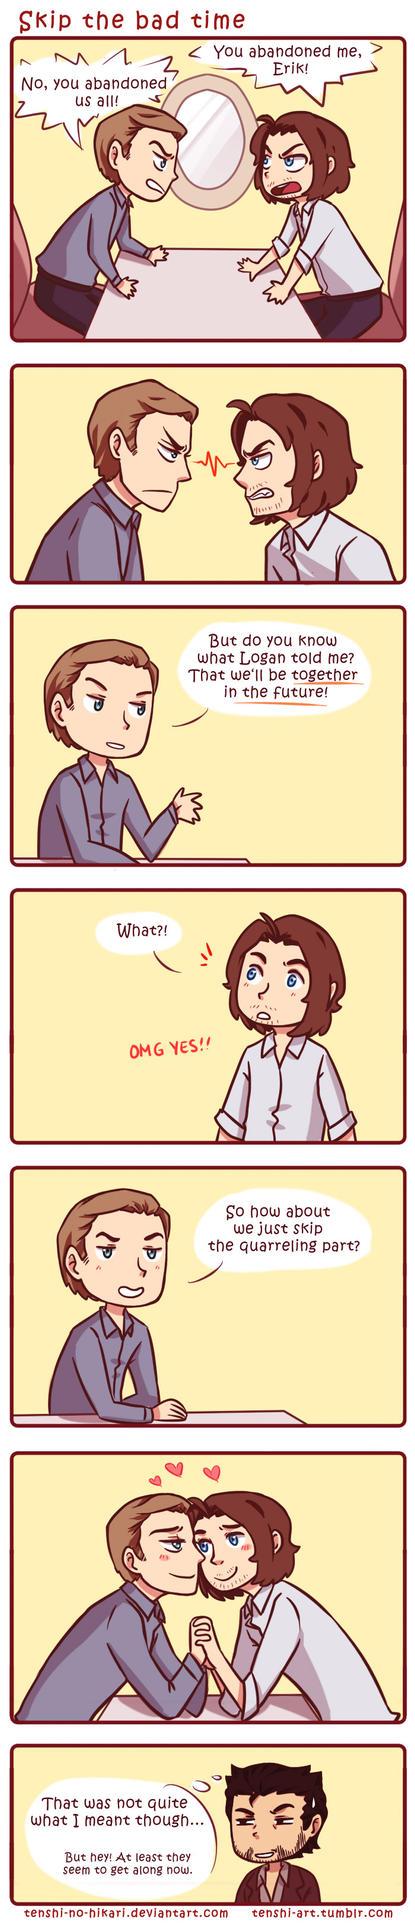 X-Men: Skip the bad time by Tenshi-no-Hikari